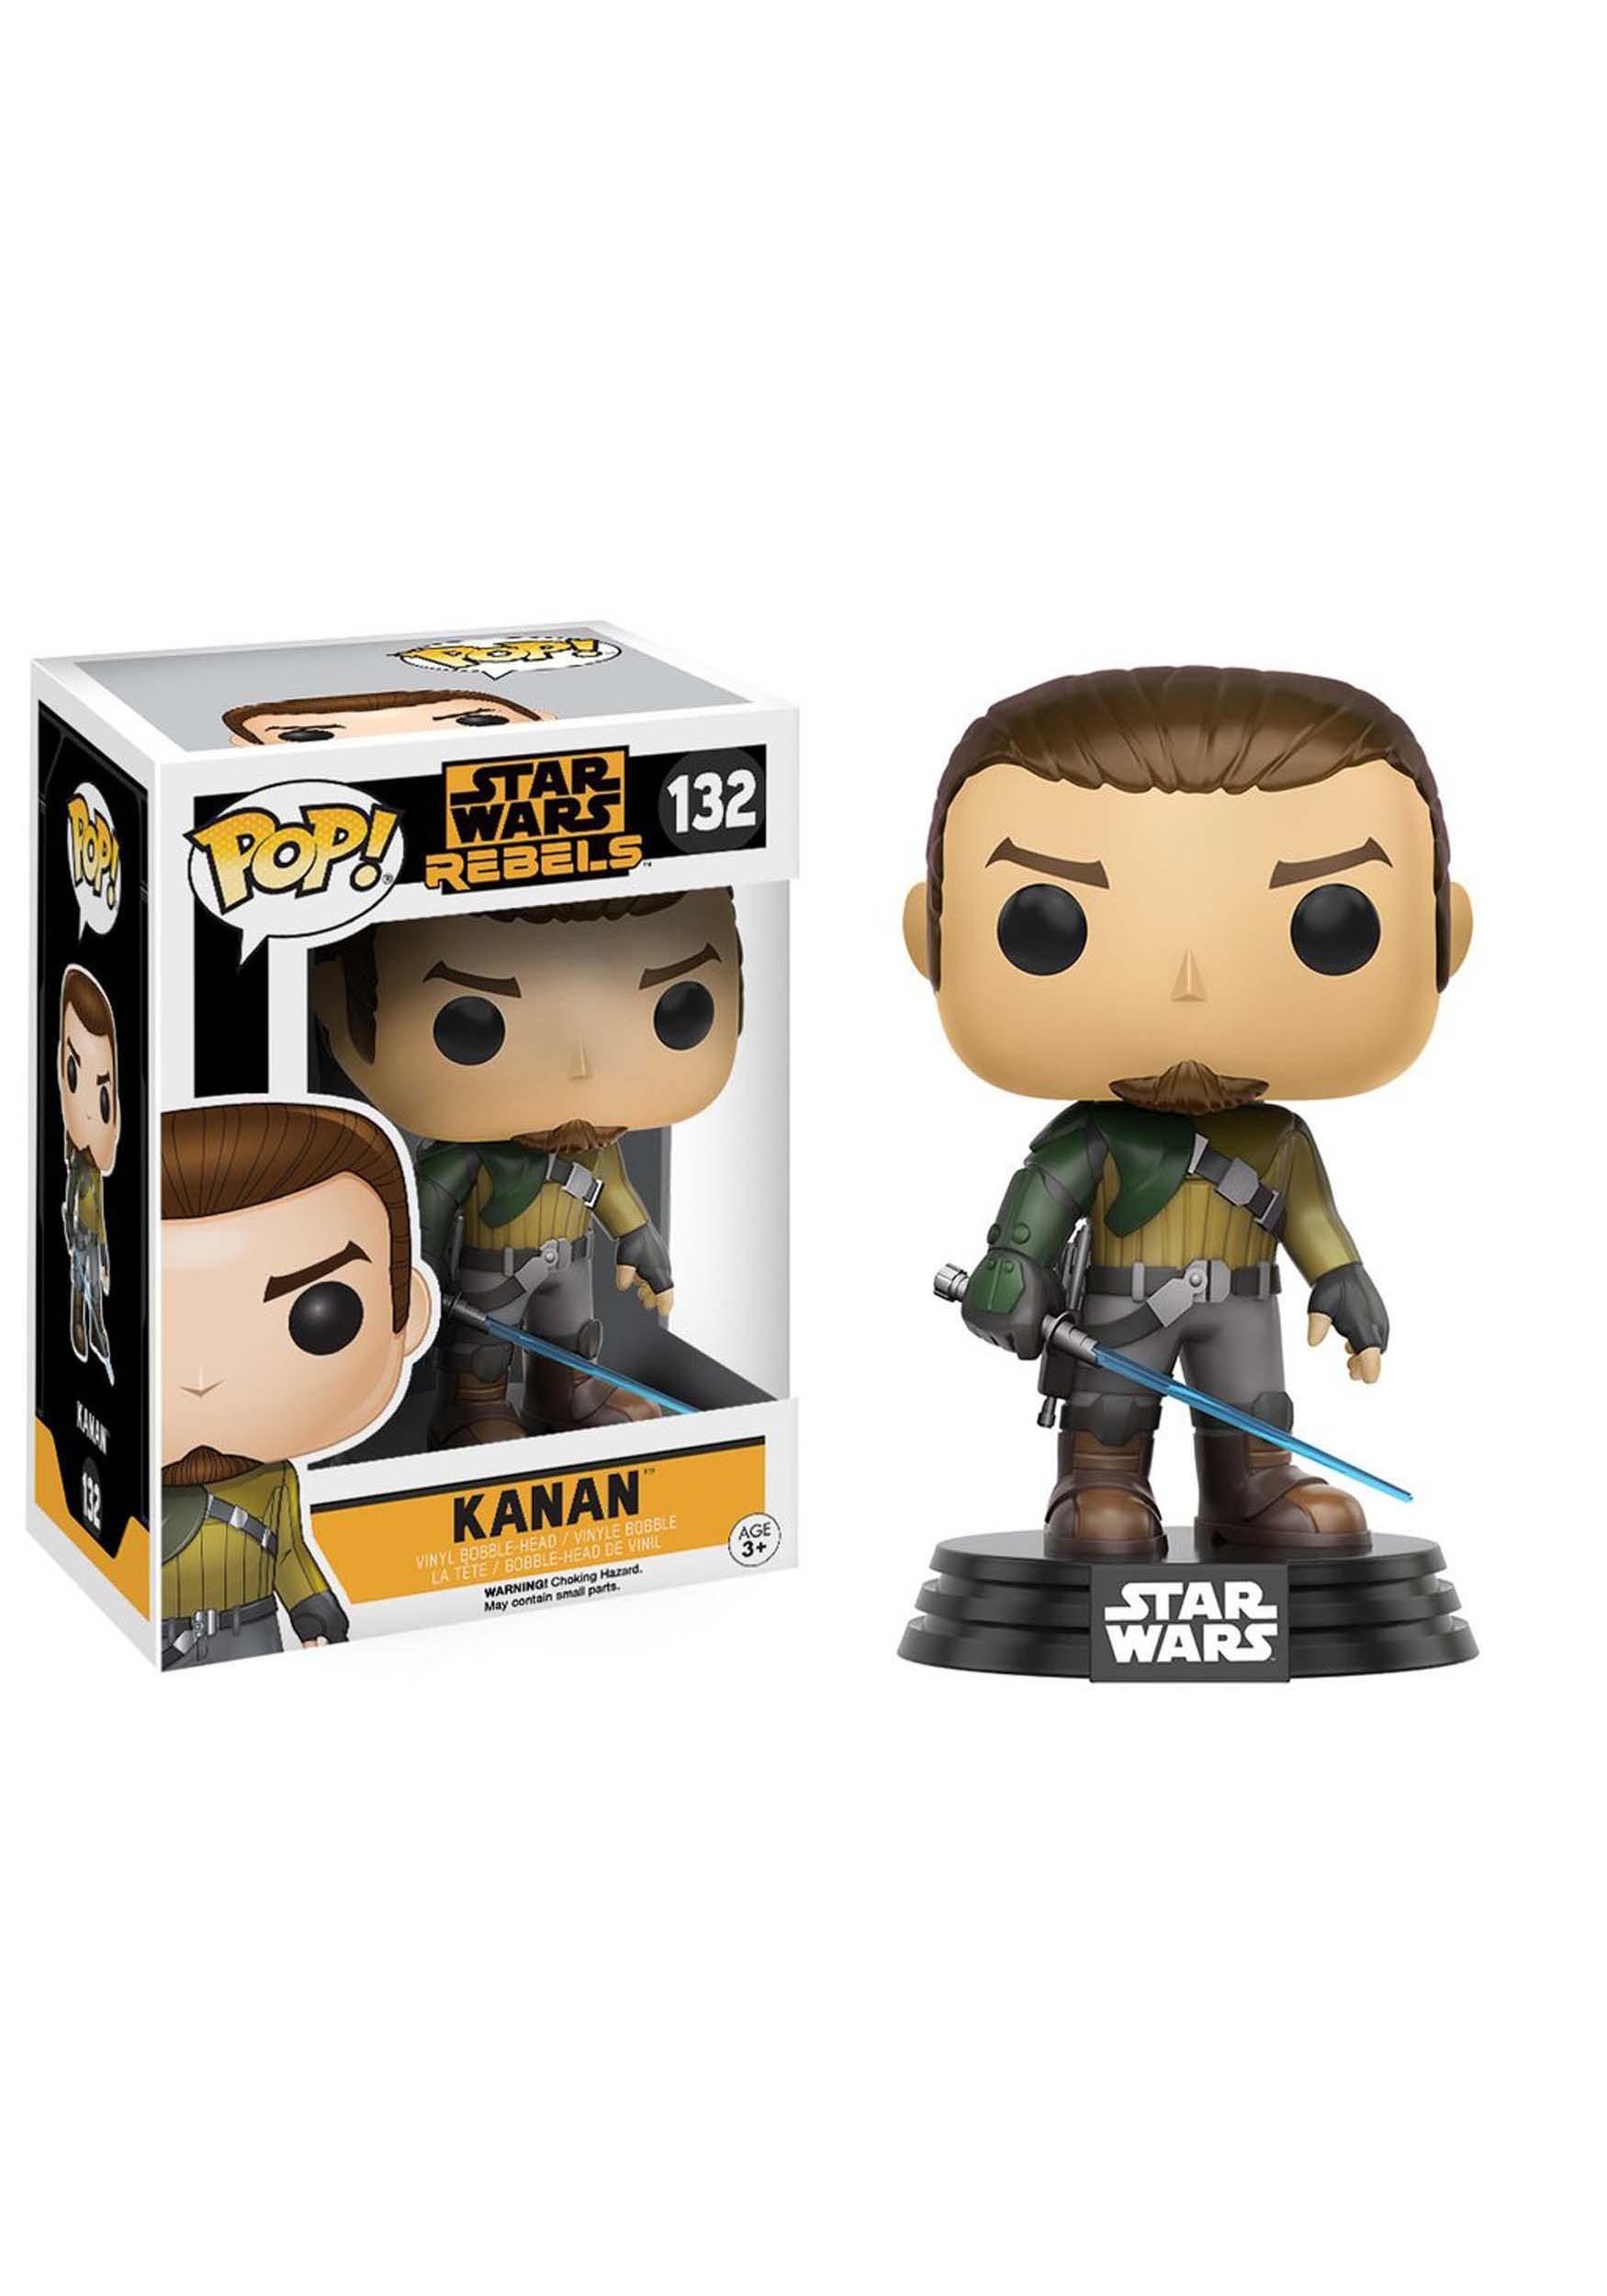 Star Wars Rebels Kanan Jarrus Bobblehead POP! Vinyl Figure FN10770